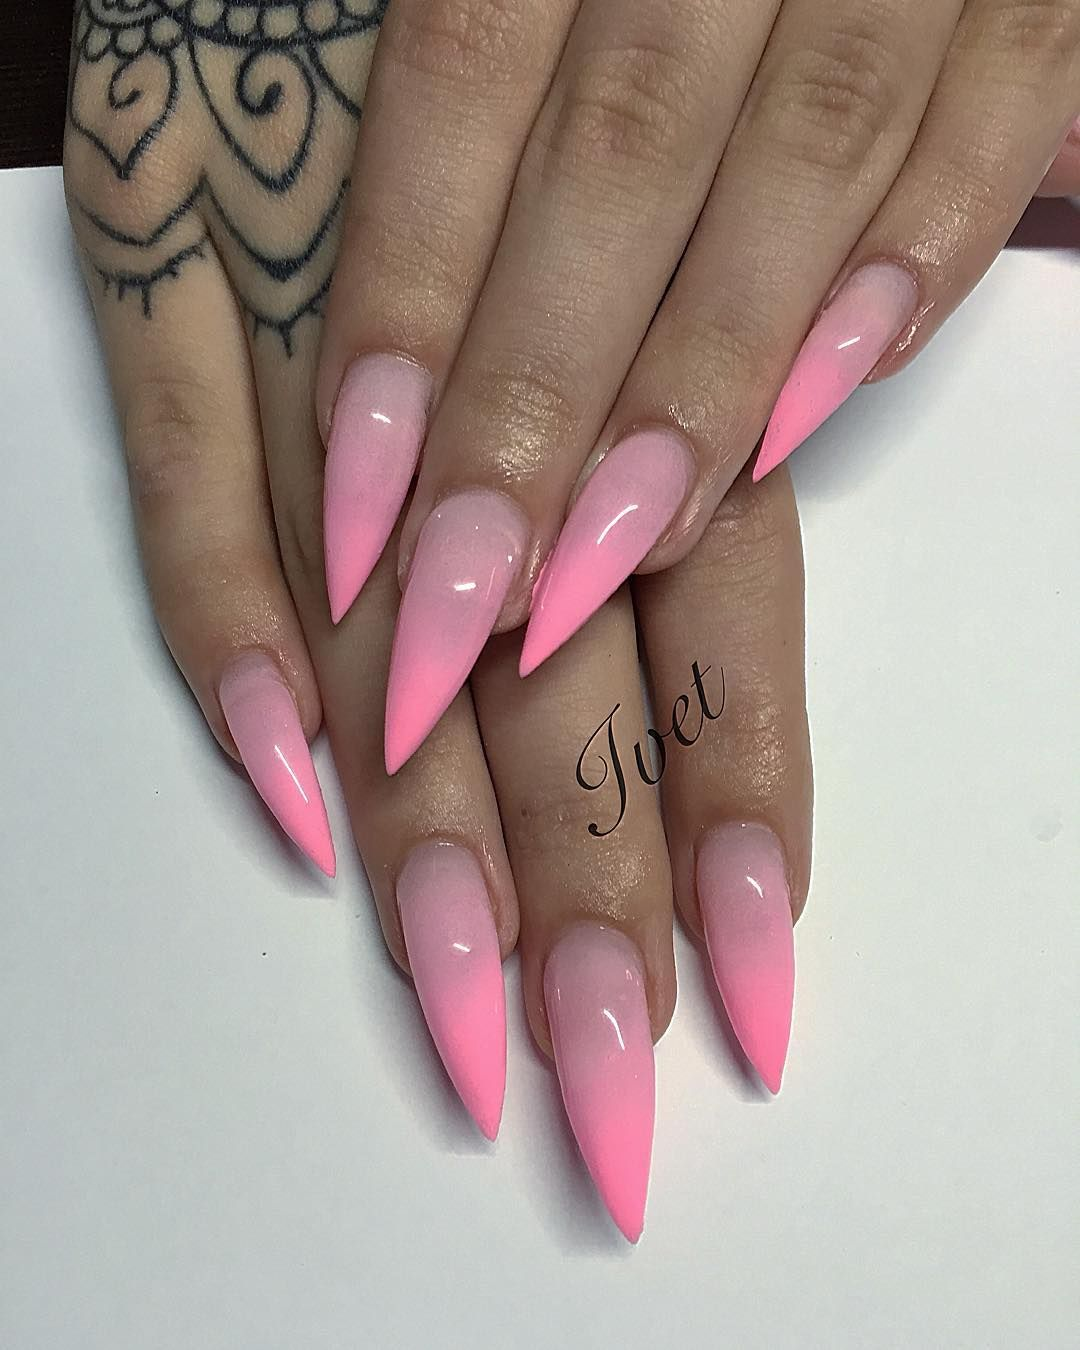 #acrylnails #sneakerpolitics #swarovskinails #silver #sommernails #nail #nailart #nsilsart #nailspa #nailsperm #nailsporn #nailspaint #nailspolish #nailsprodigy #nailspromagazine #hudabeauty #huda #hudalashes #huda_beauty #Riri #badgalriri #badgirl #rihanna #pink #pinknails #pinkbubbles #plushtiere #pumafenty #tattoohand #handtattoos